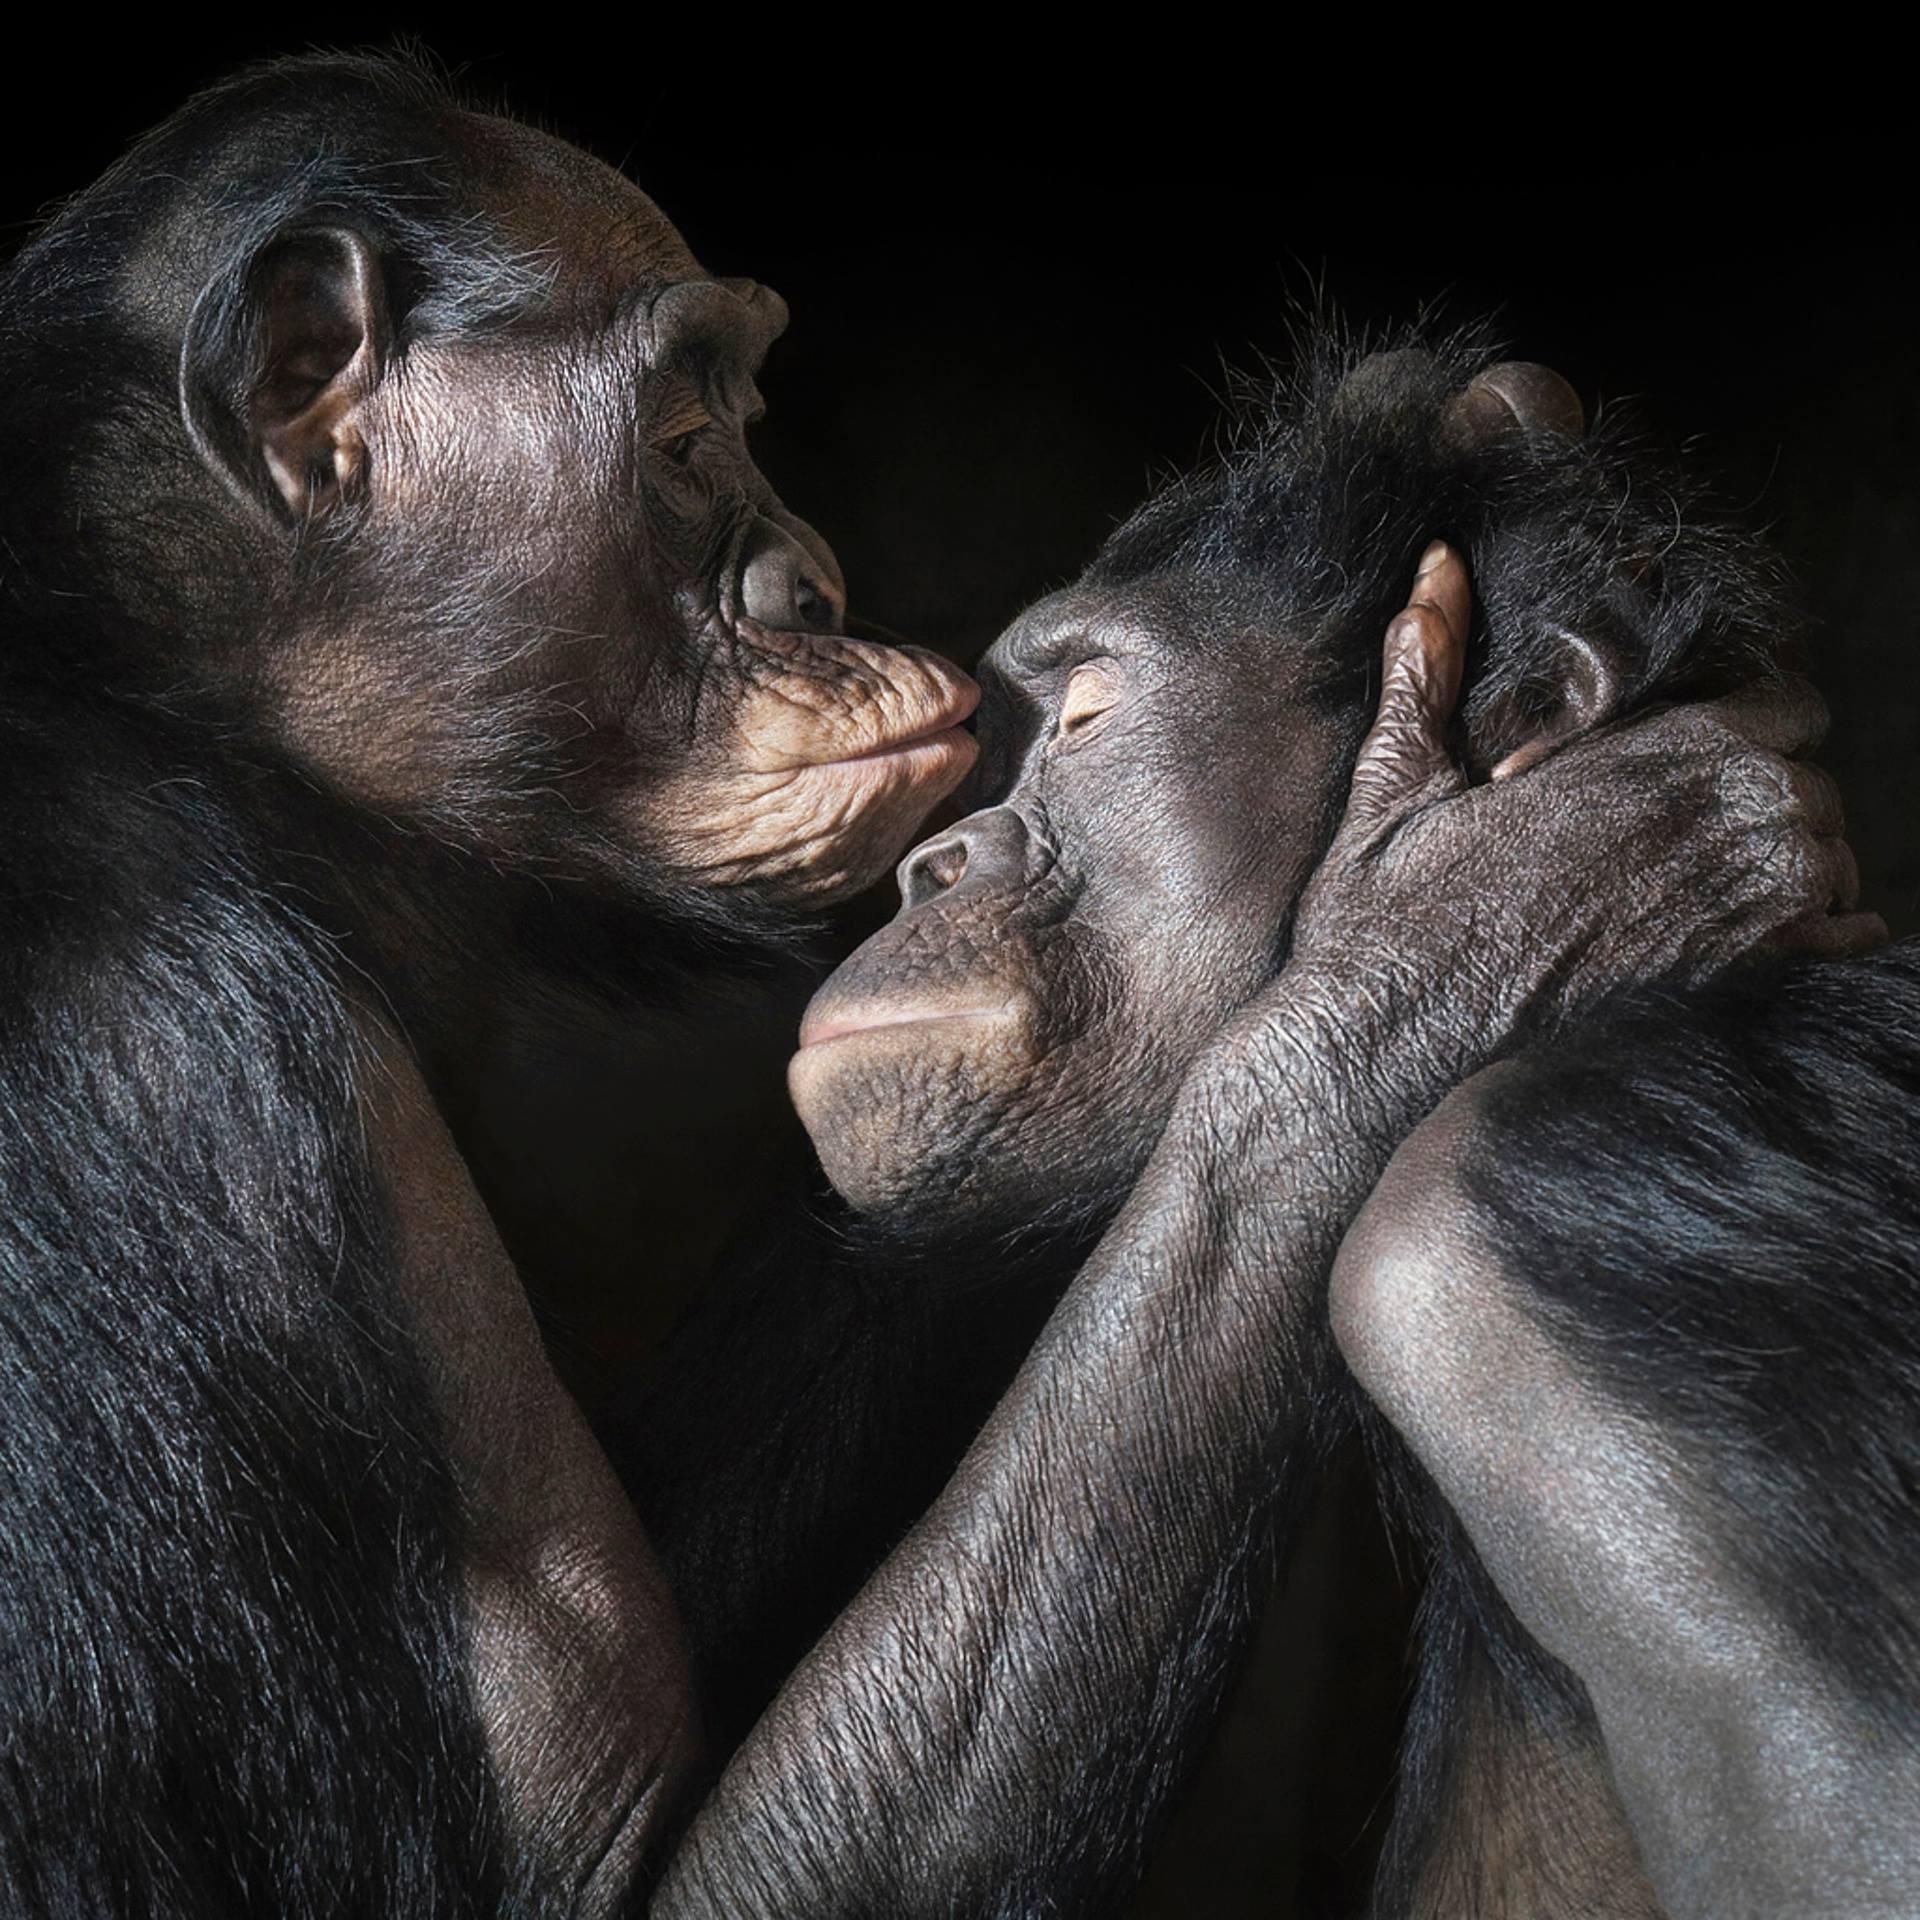 Nonhuman animal legal personhood – Sakshi Aravind